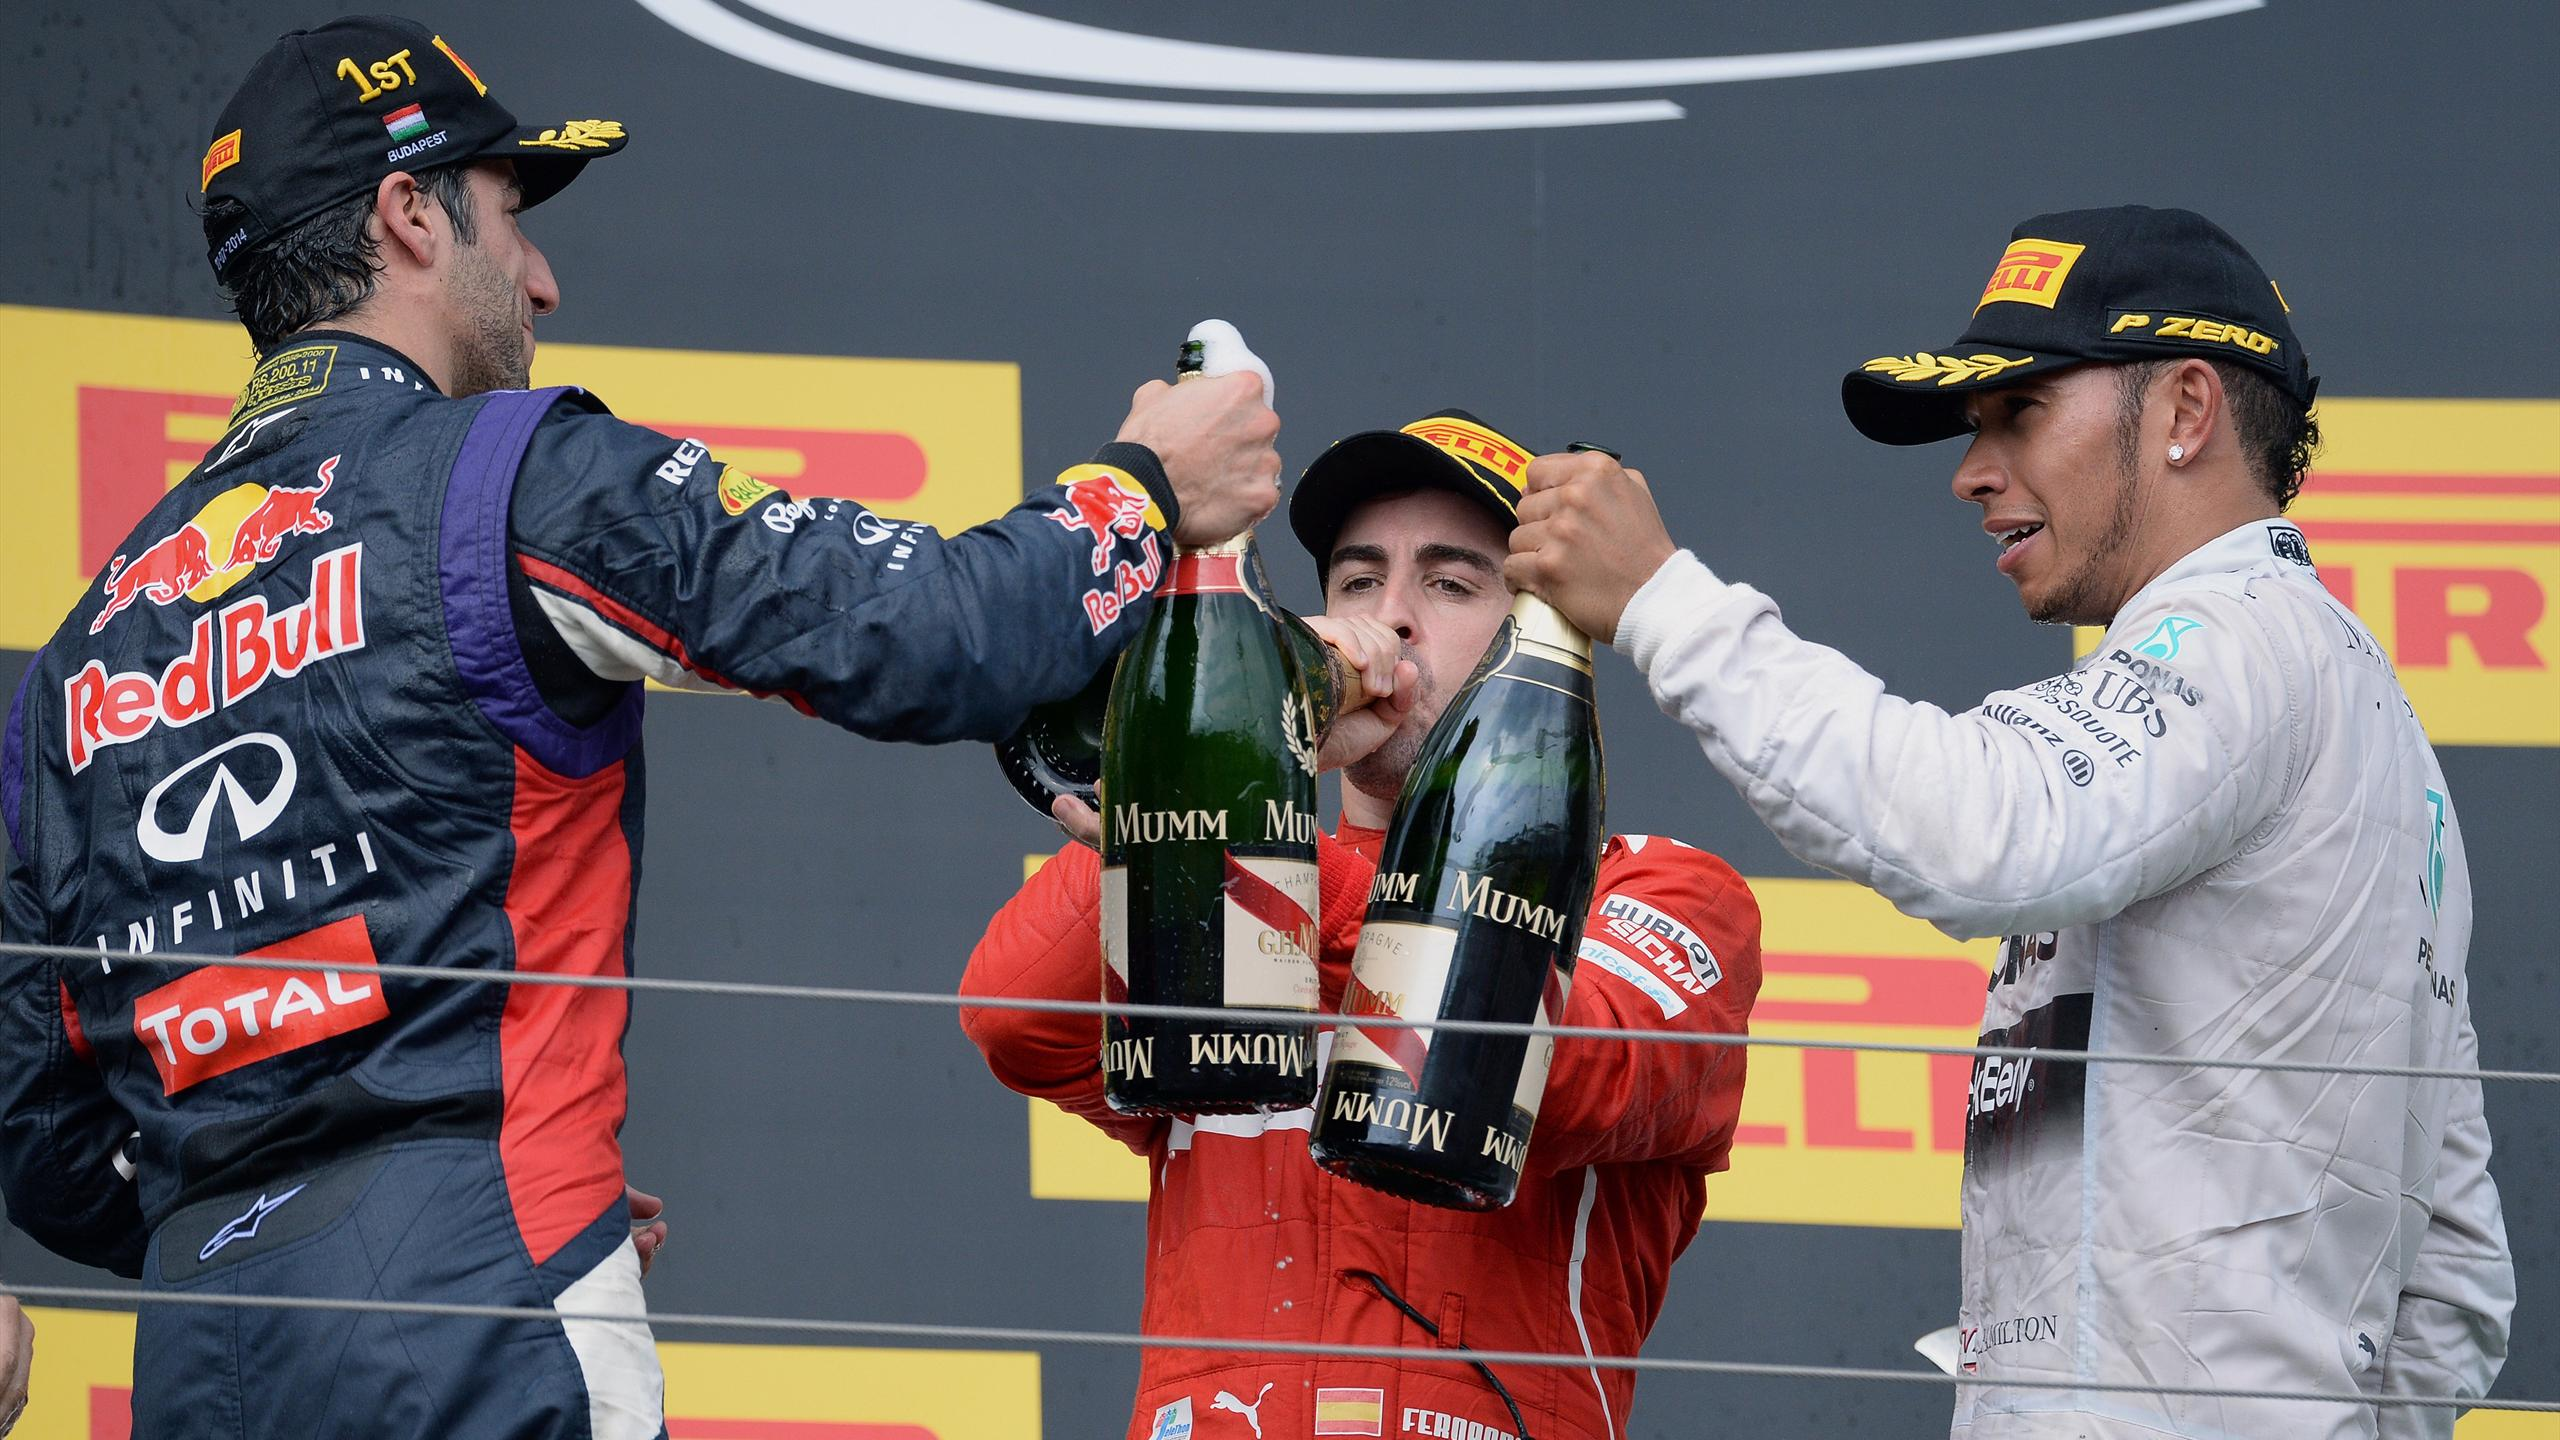 Fernando Alonso (Ferrari), Daniel Ricciardo (Red Bull), Lewis Hamilton (Mercedes) -  2014 Macaristan GP